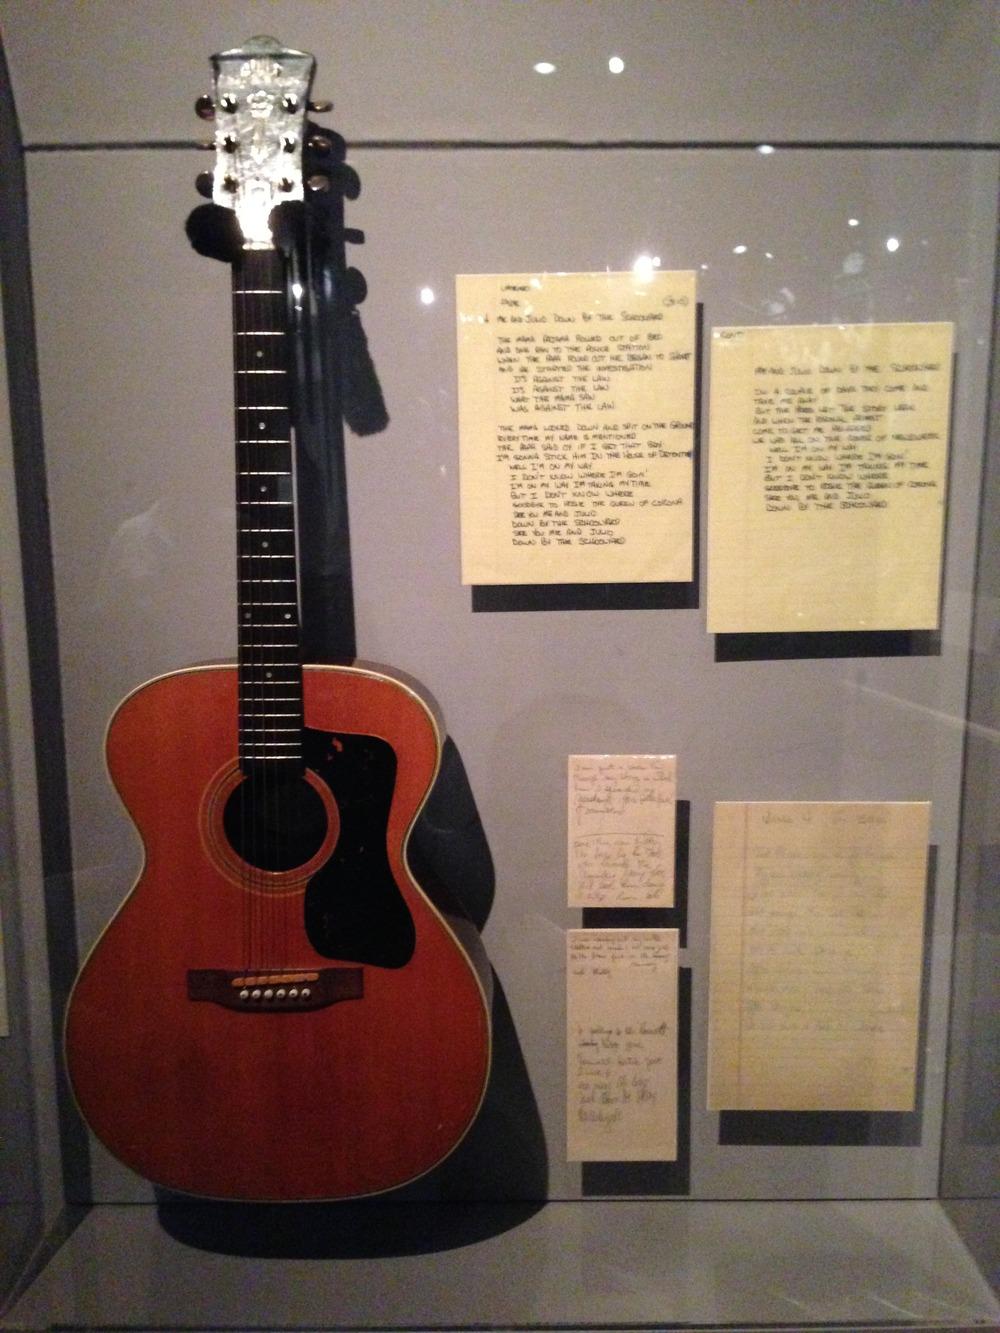 Paul Simon's Guitar and Lyrics